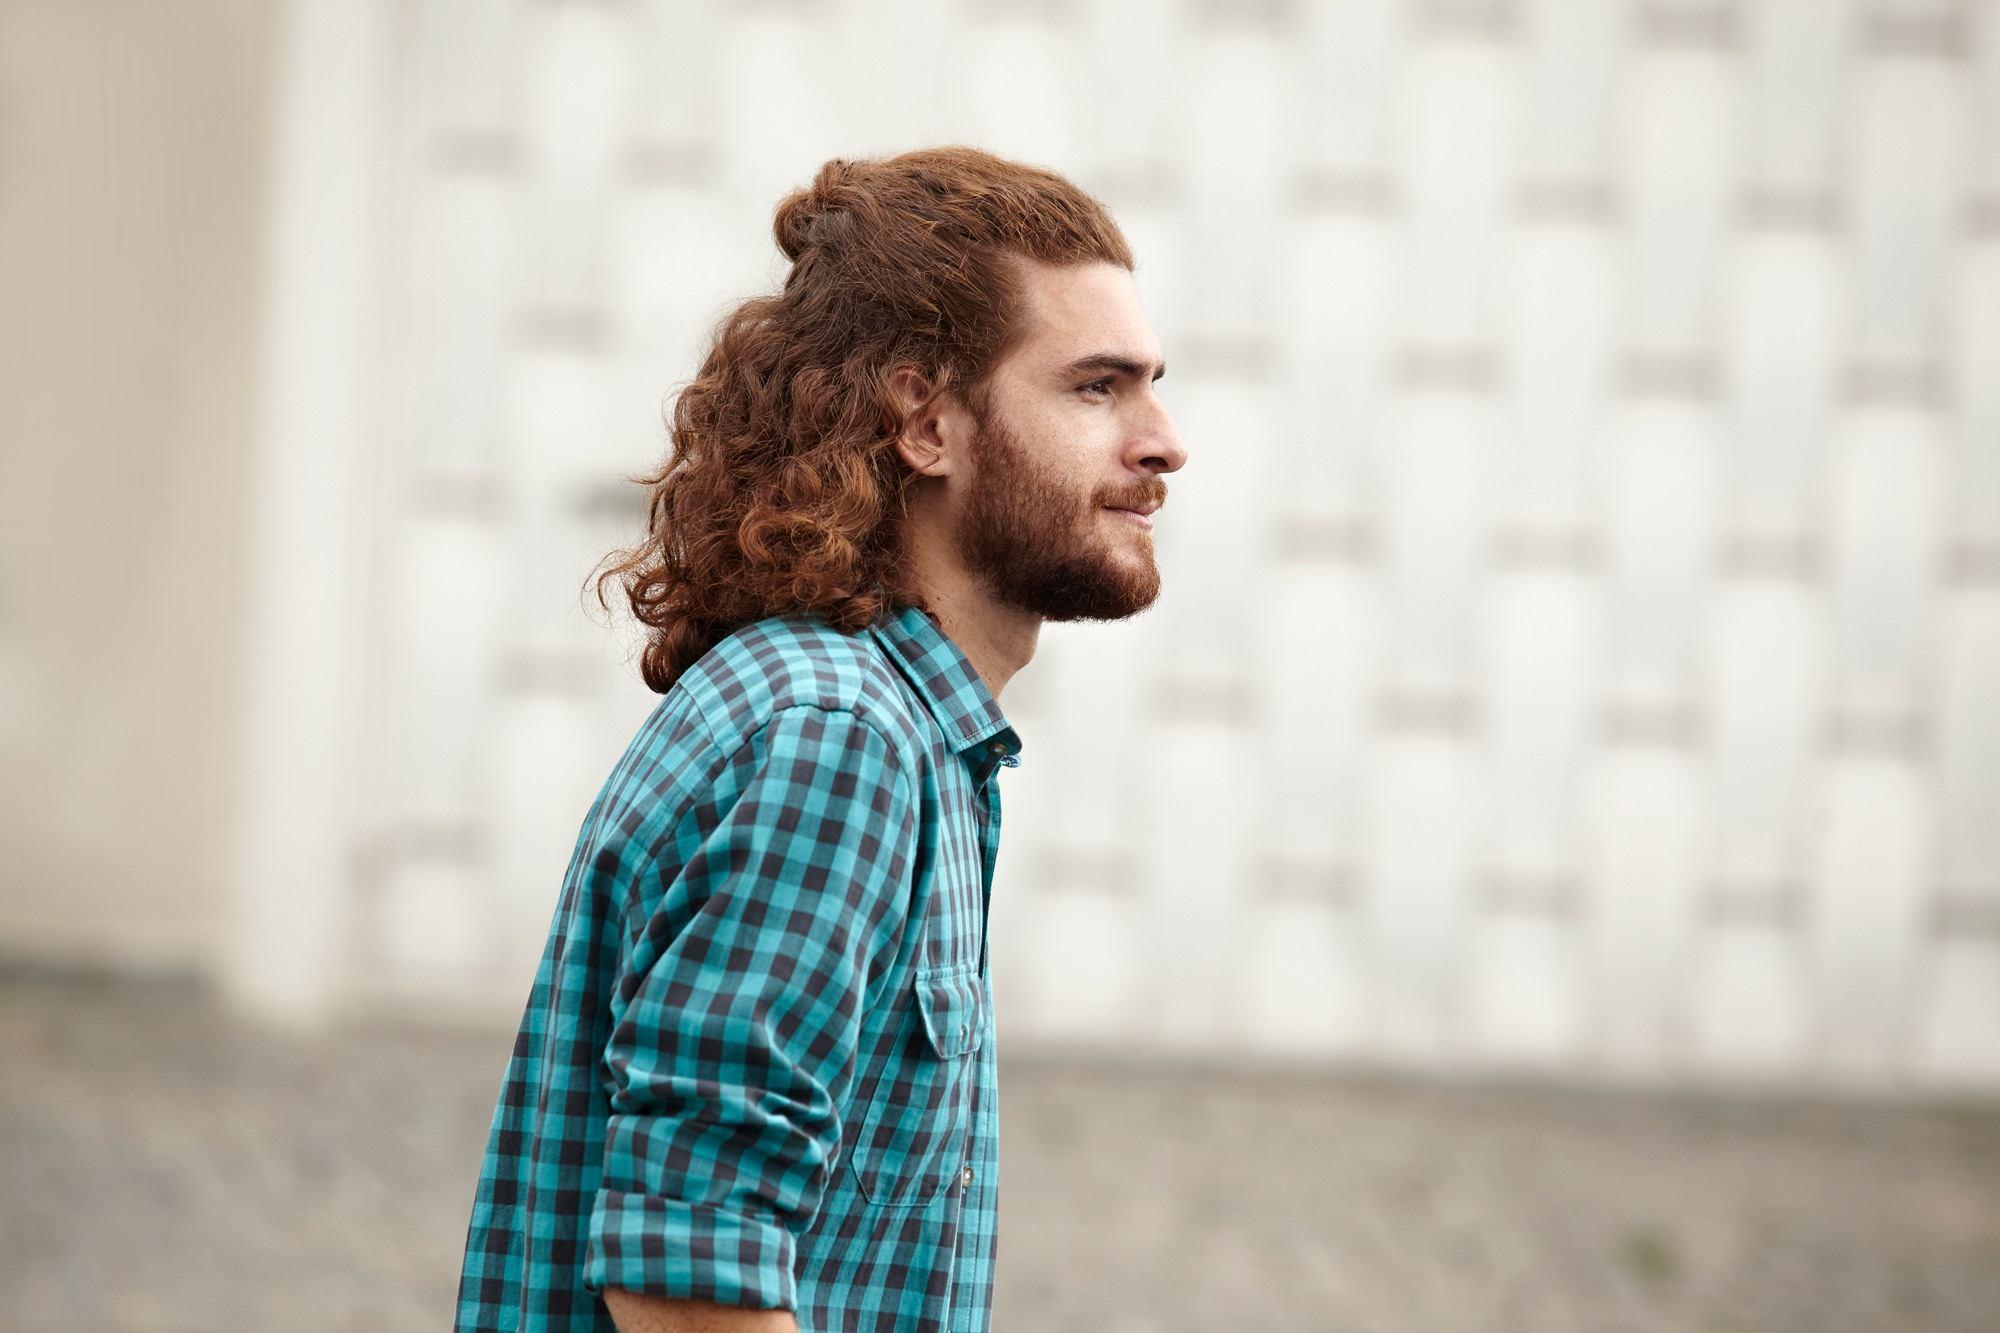 curly hairstyles for men 2017 half-up man bun